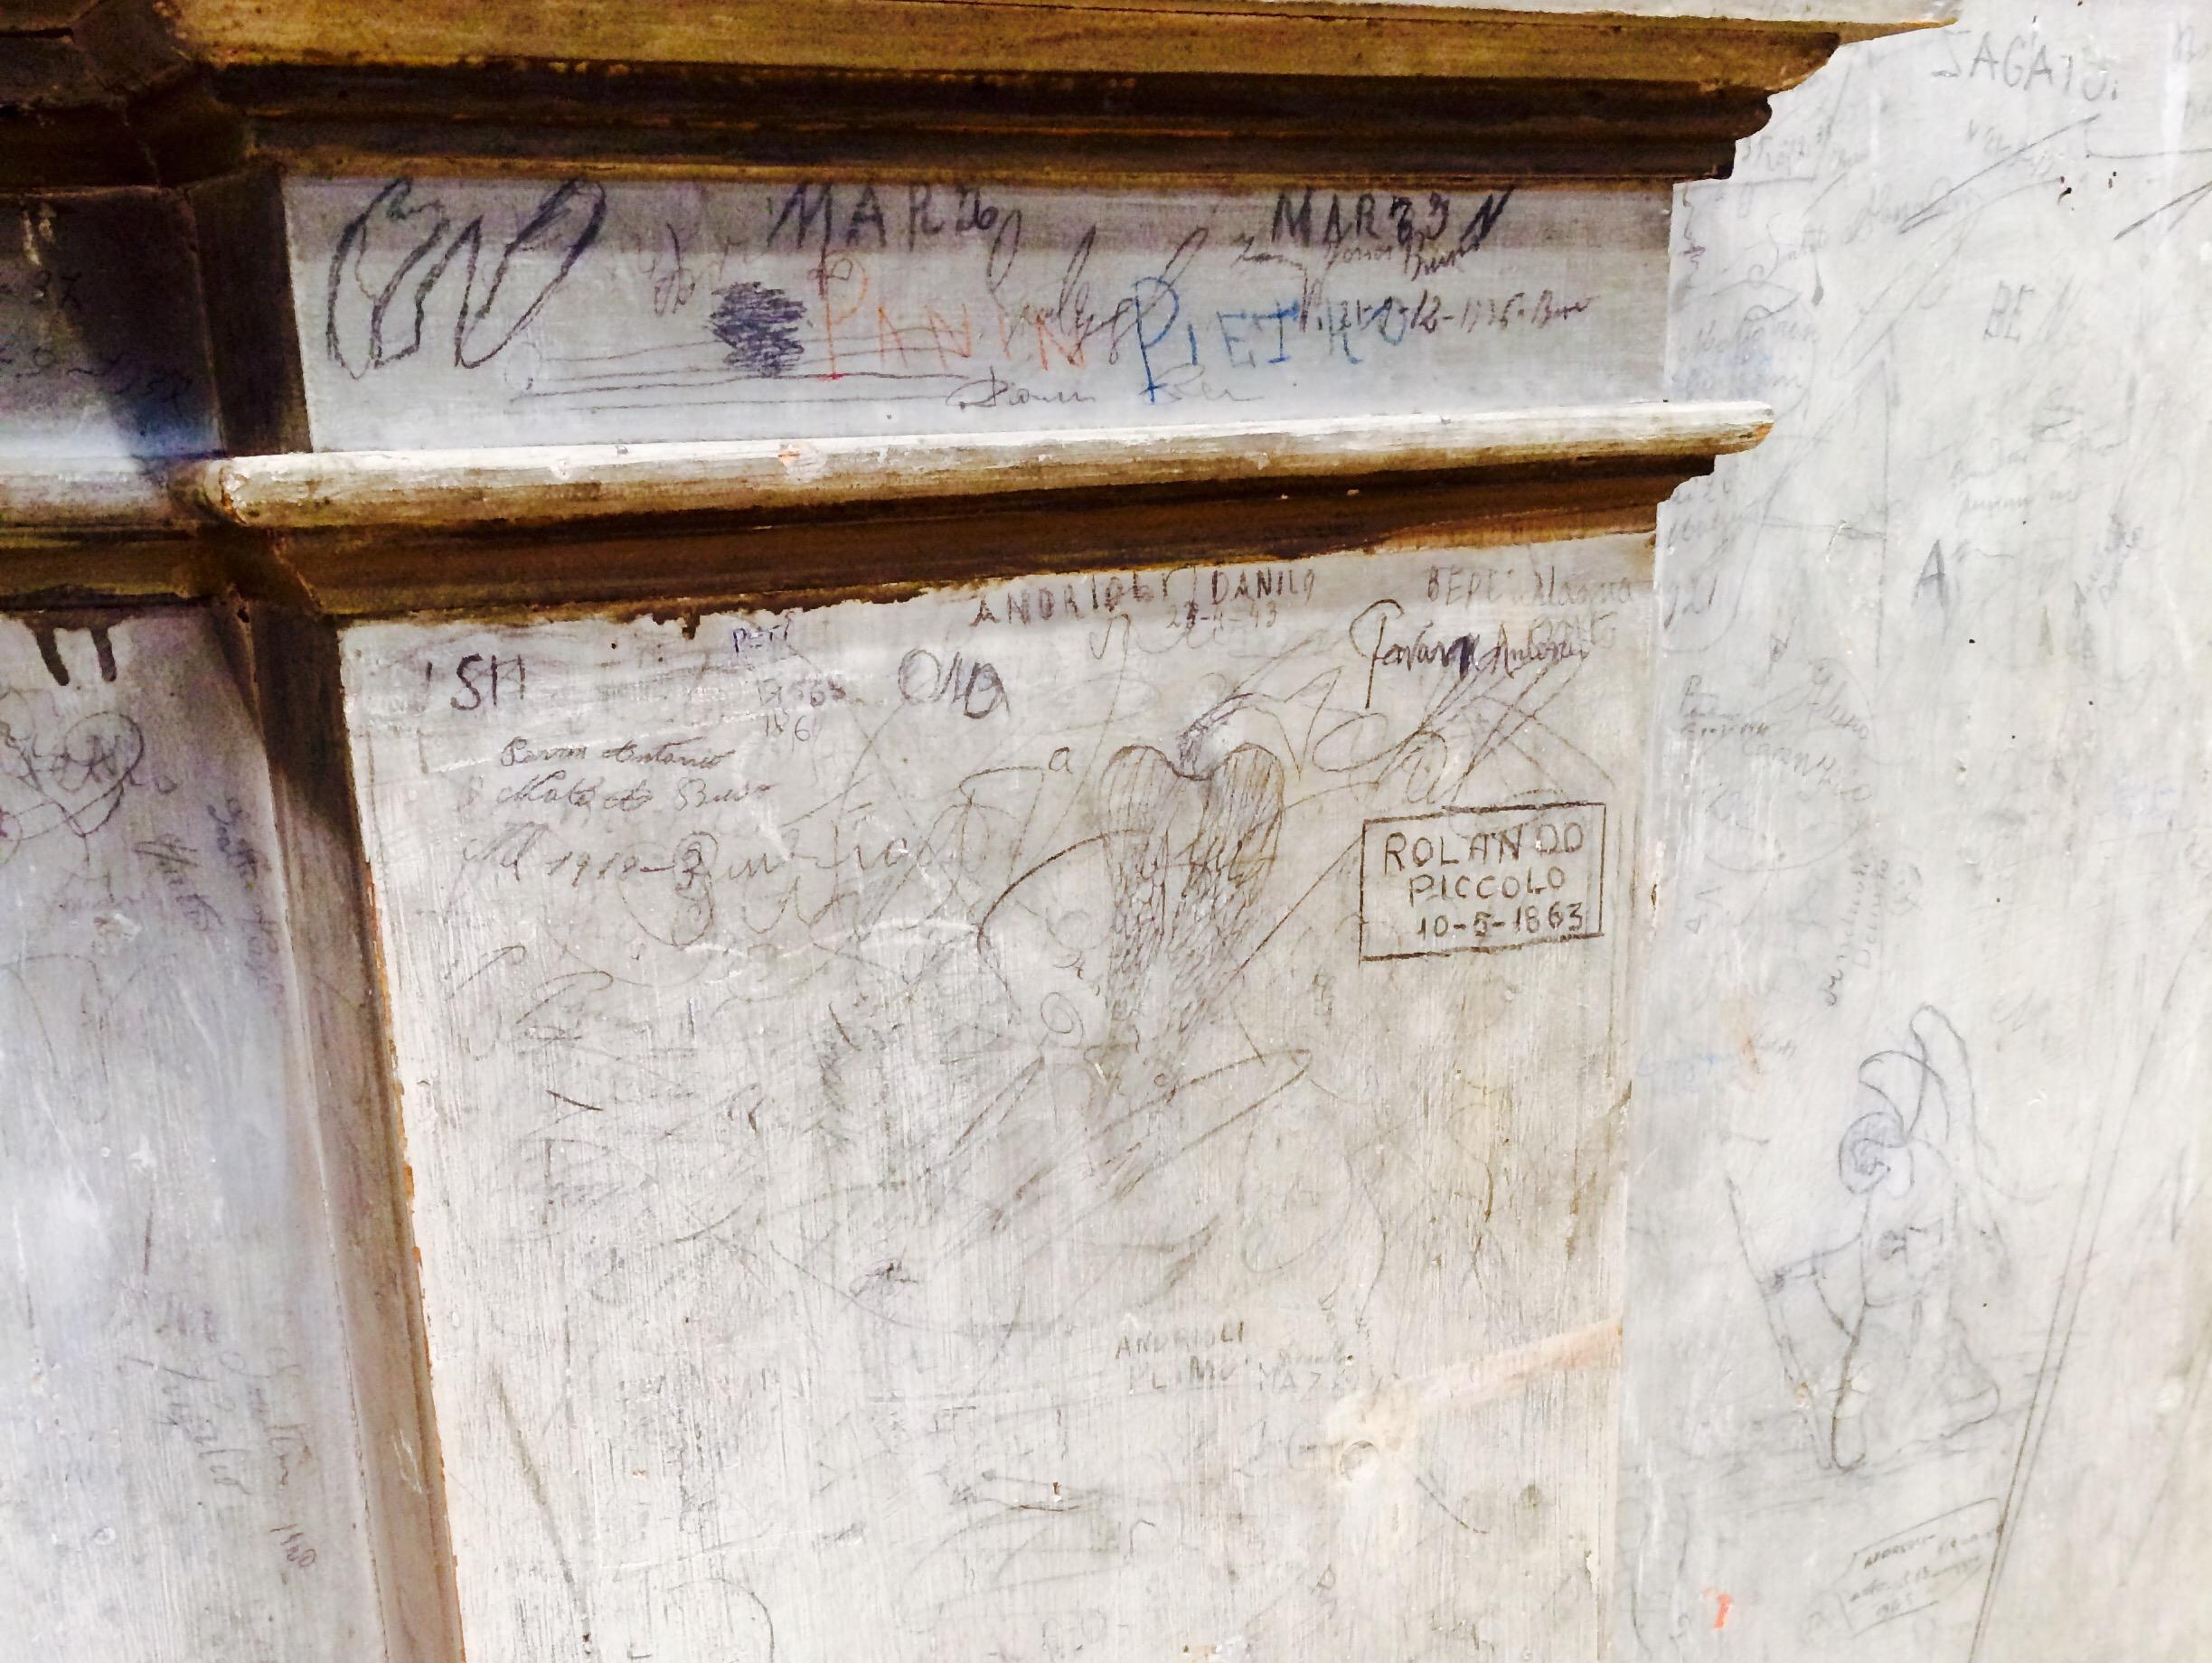 Centuries-old graffiti adorns the case of the historic Italian organ